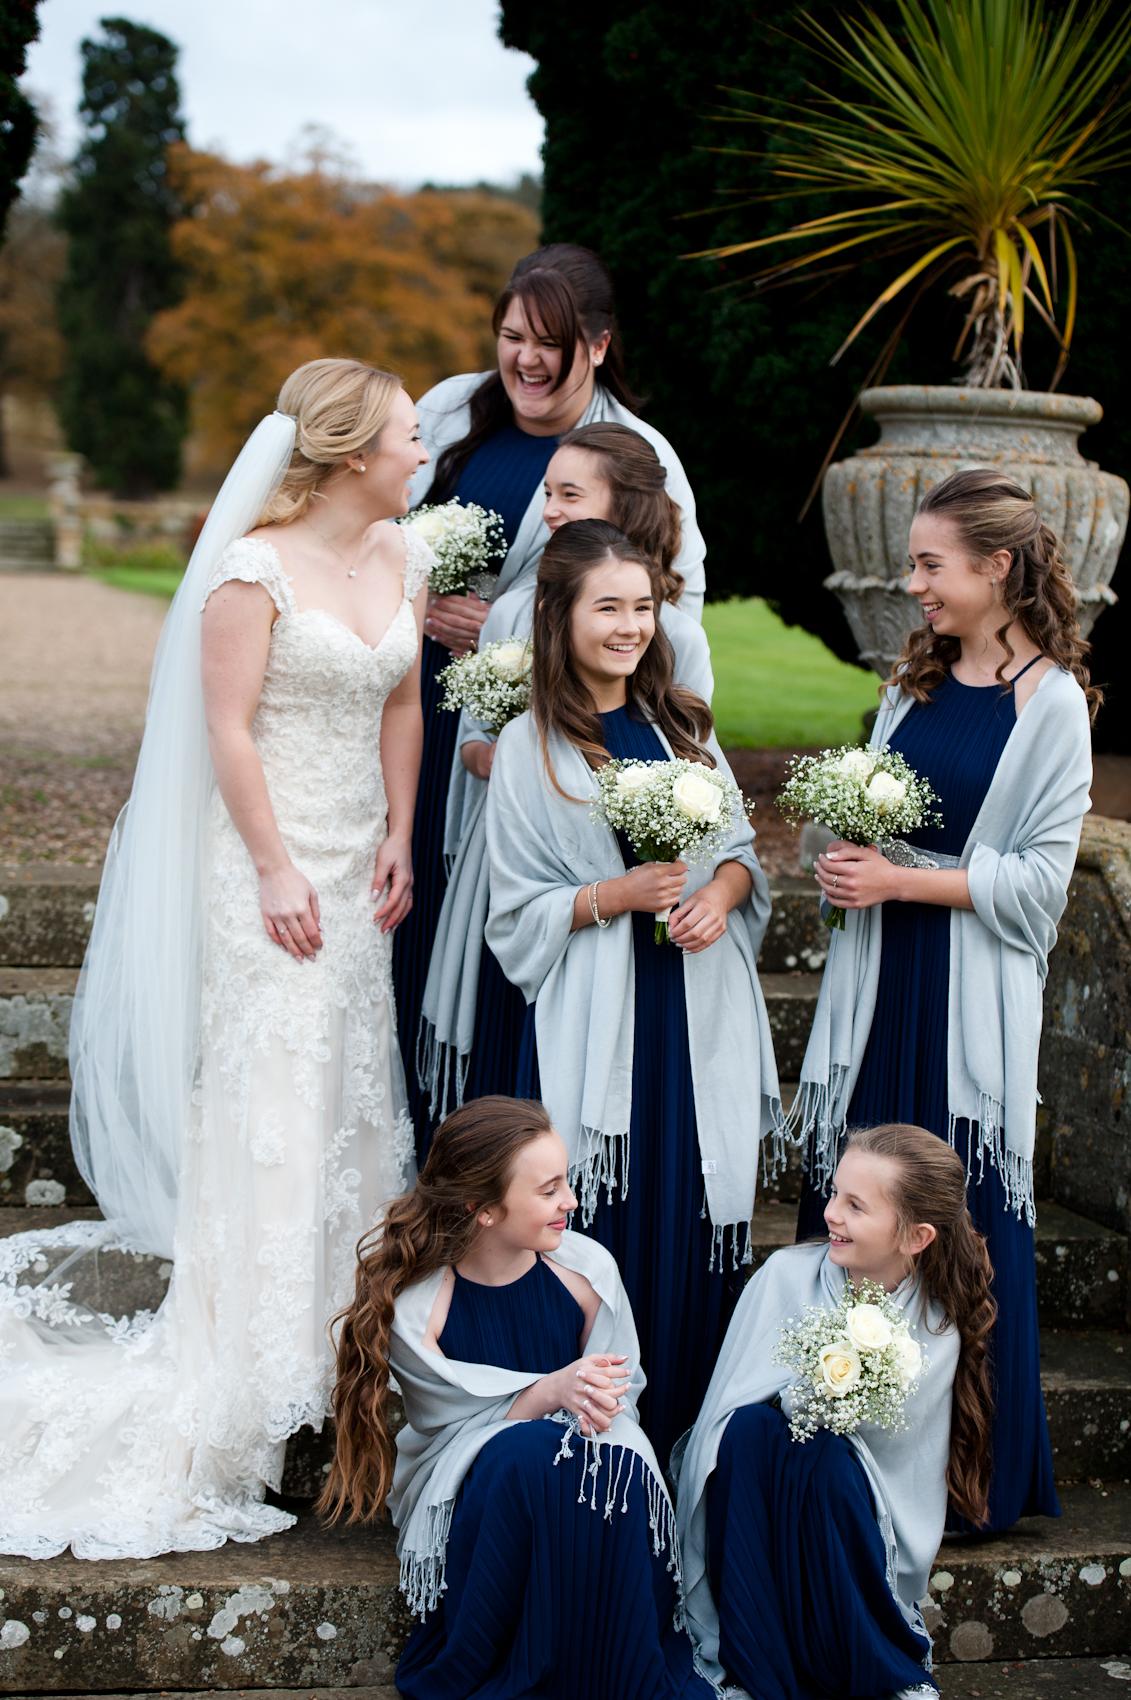 Declan & Emma wedding (19 of 29).jpg